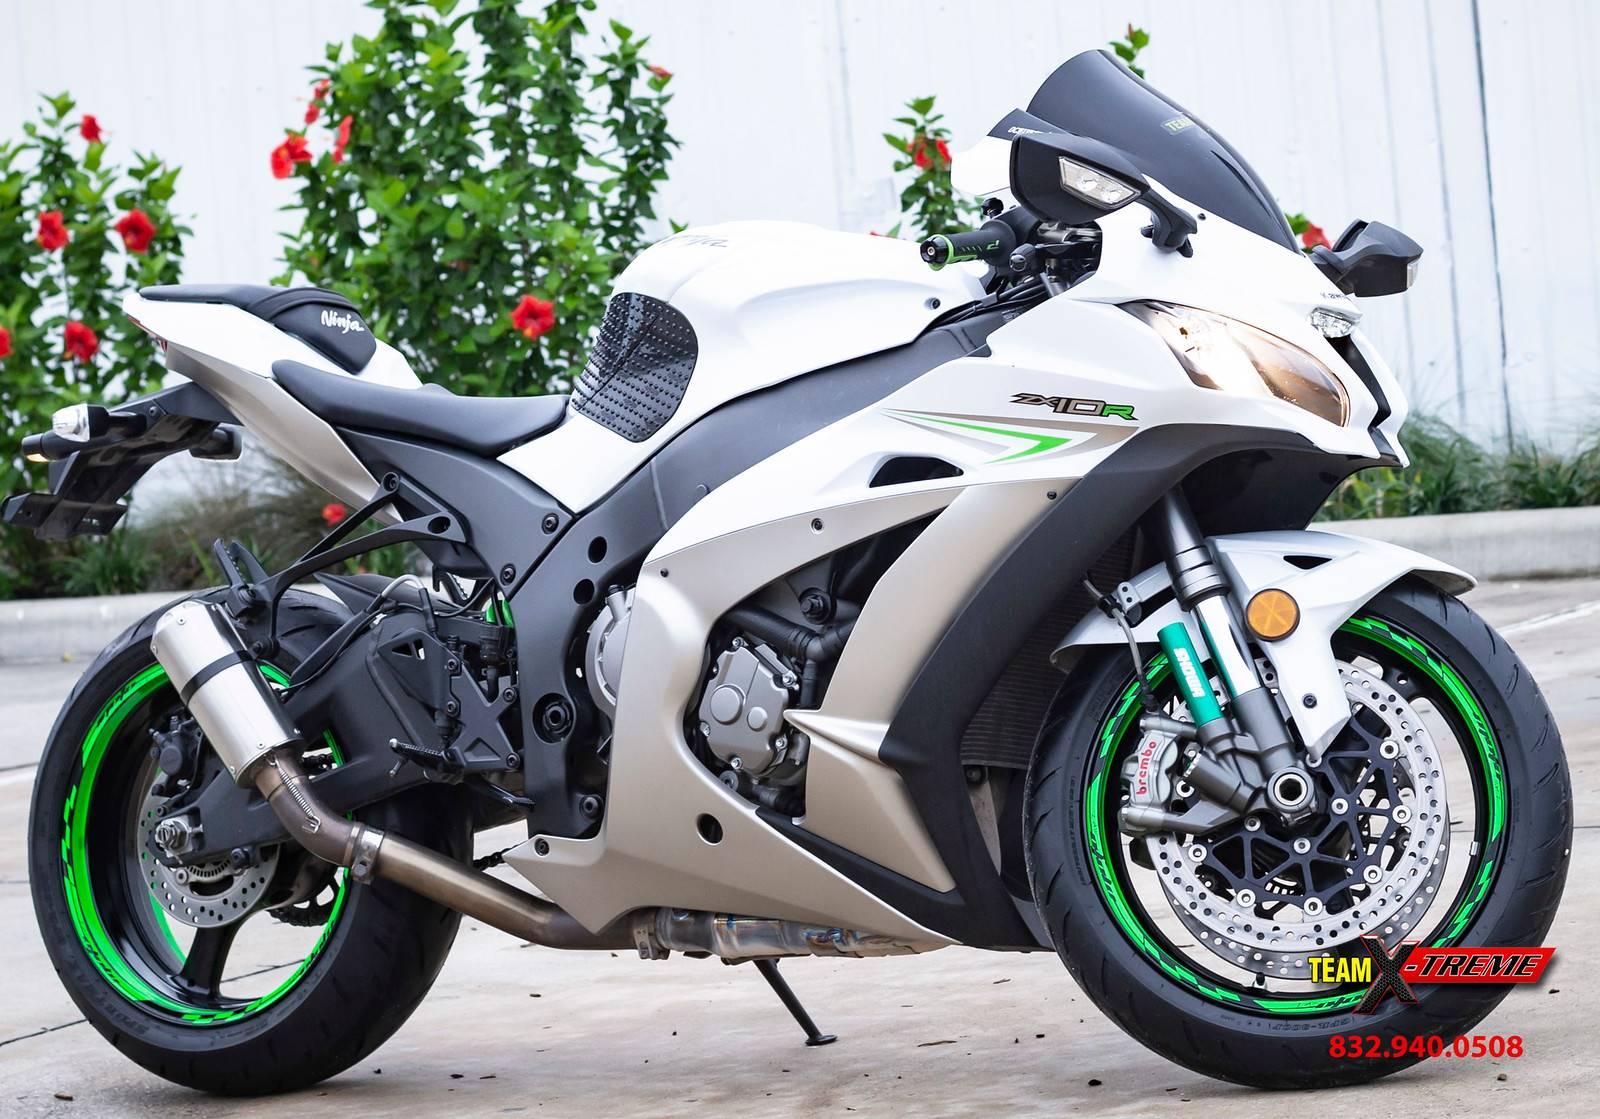 Used 2017 Kawasaki Ninja Zx 10r Motorcycles In Houston Tx Stock